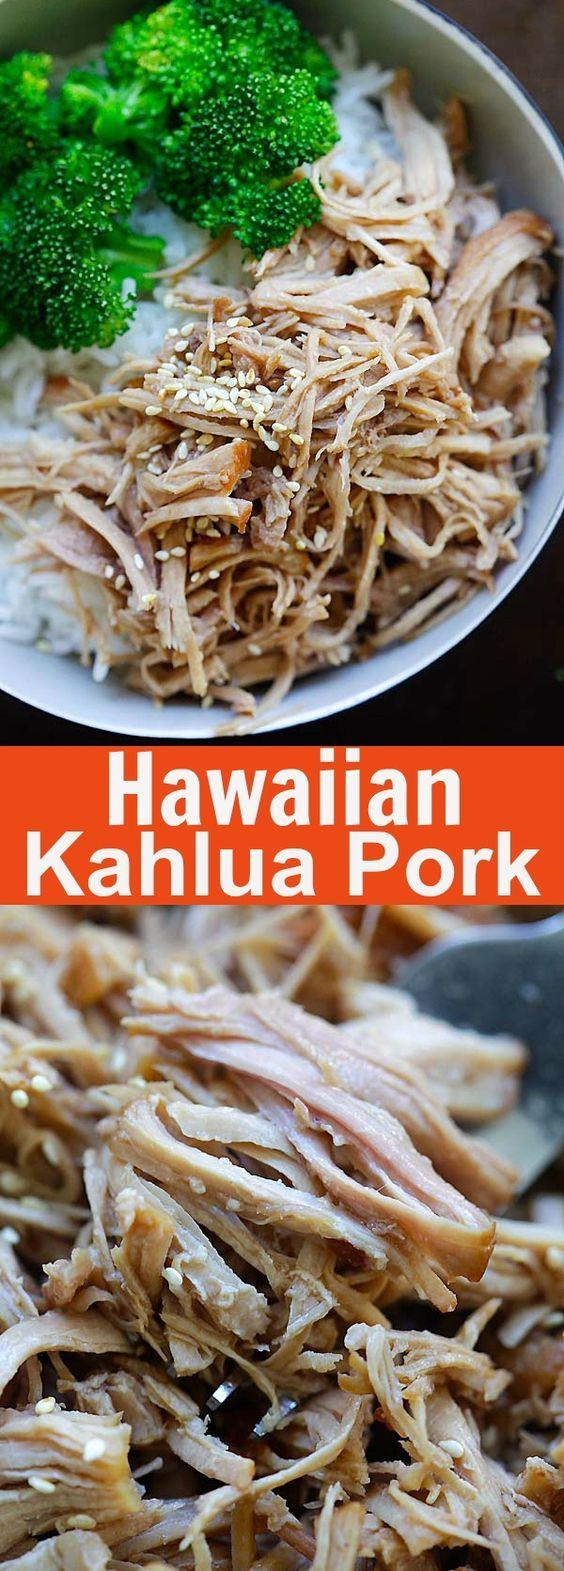 Hawaiian Kalua Pork Recipe